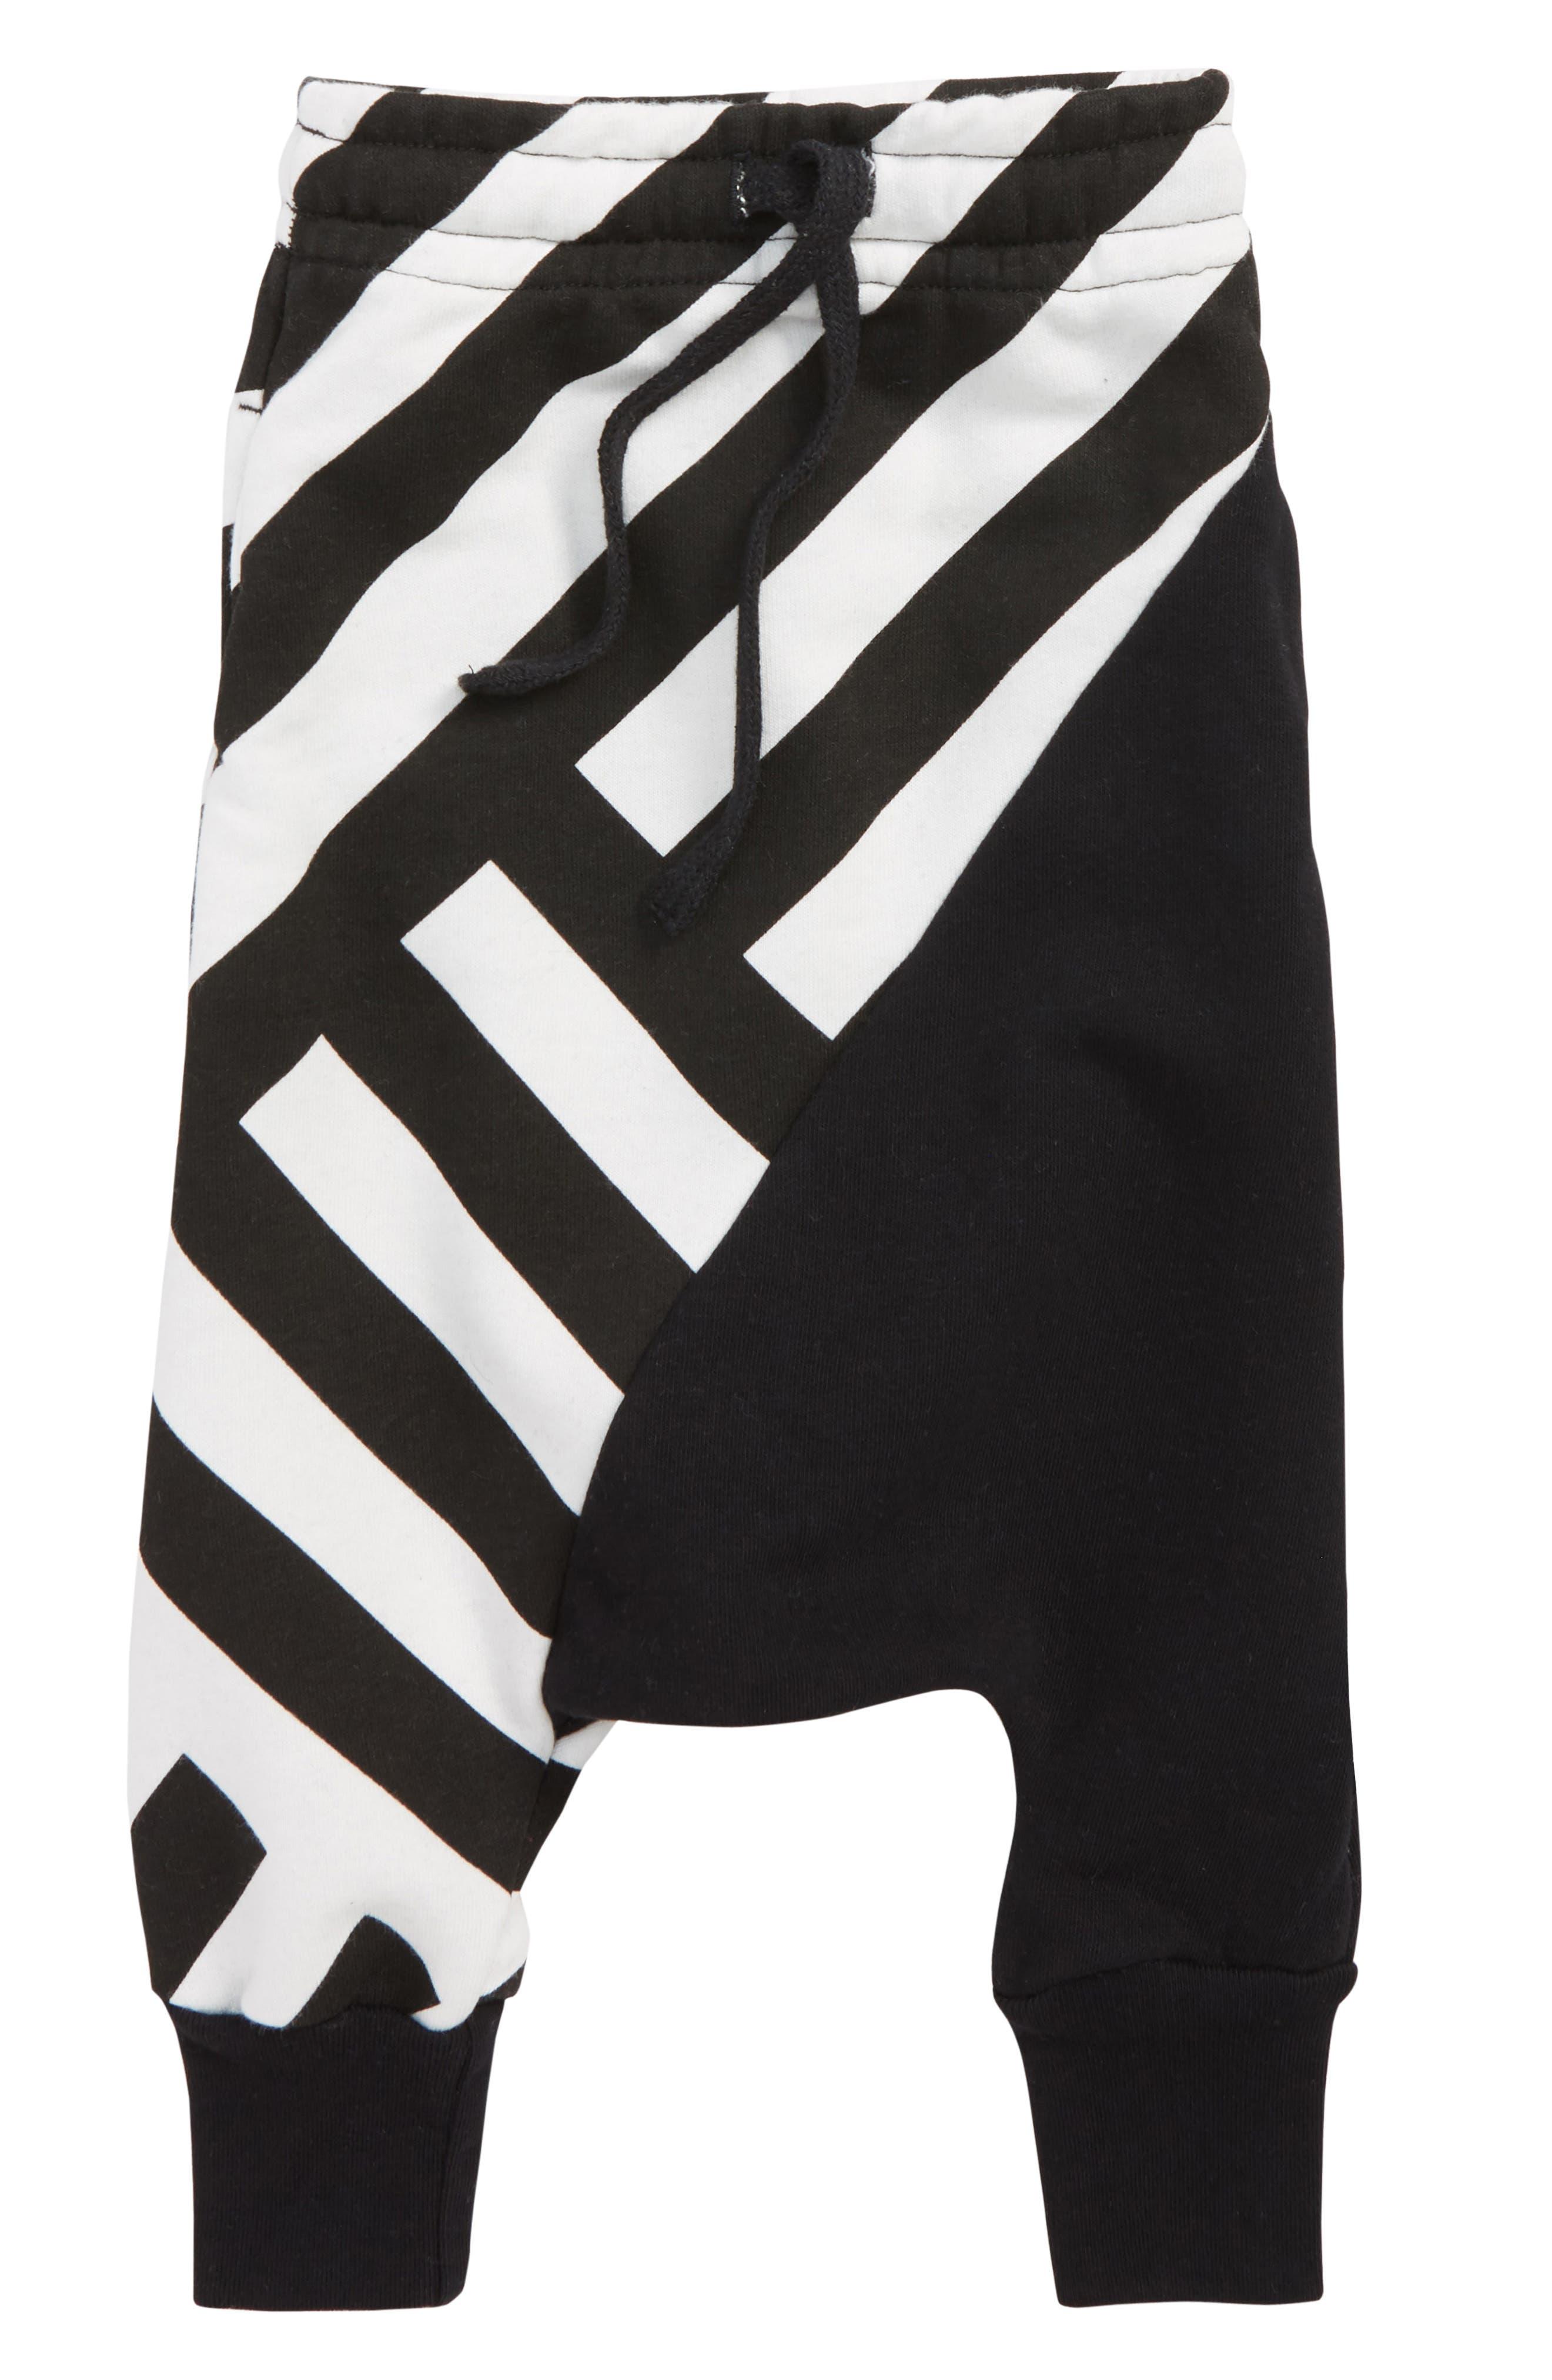 Stripe Baggy Pants,                             Main thumbnail 1, color,                             003